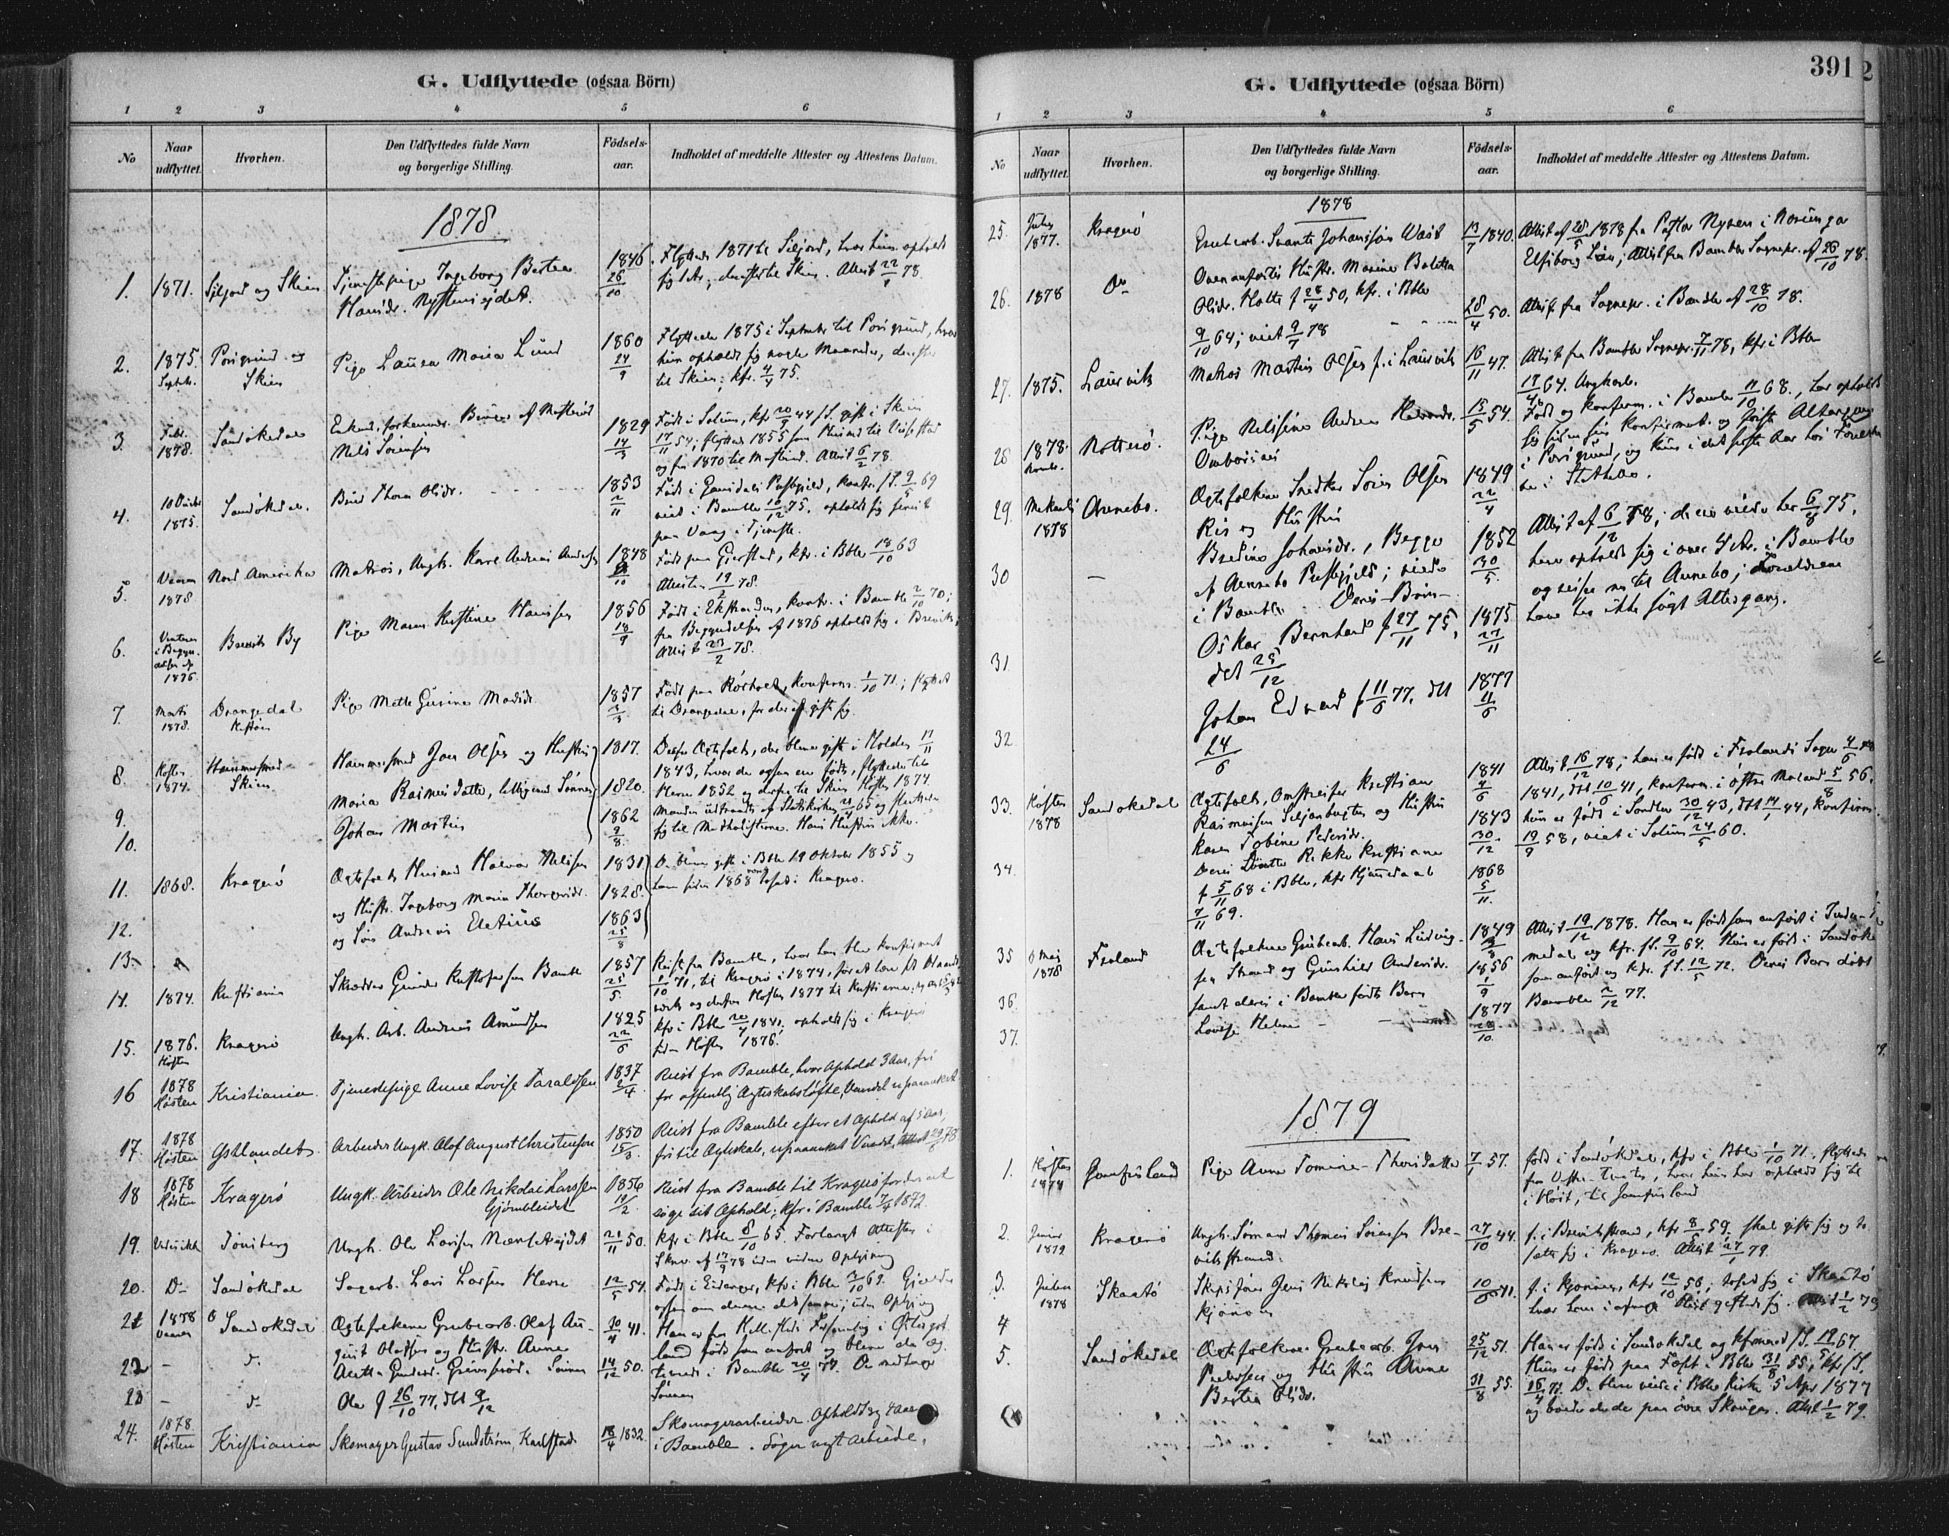 SAKO, Bamble kirkebøker, F/Fa/L0007: Ministerialbok nr. I 7, 1878-1888, s. 391